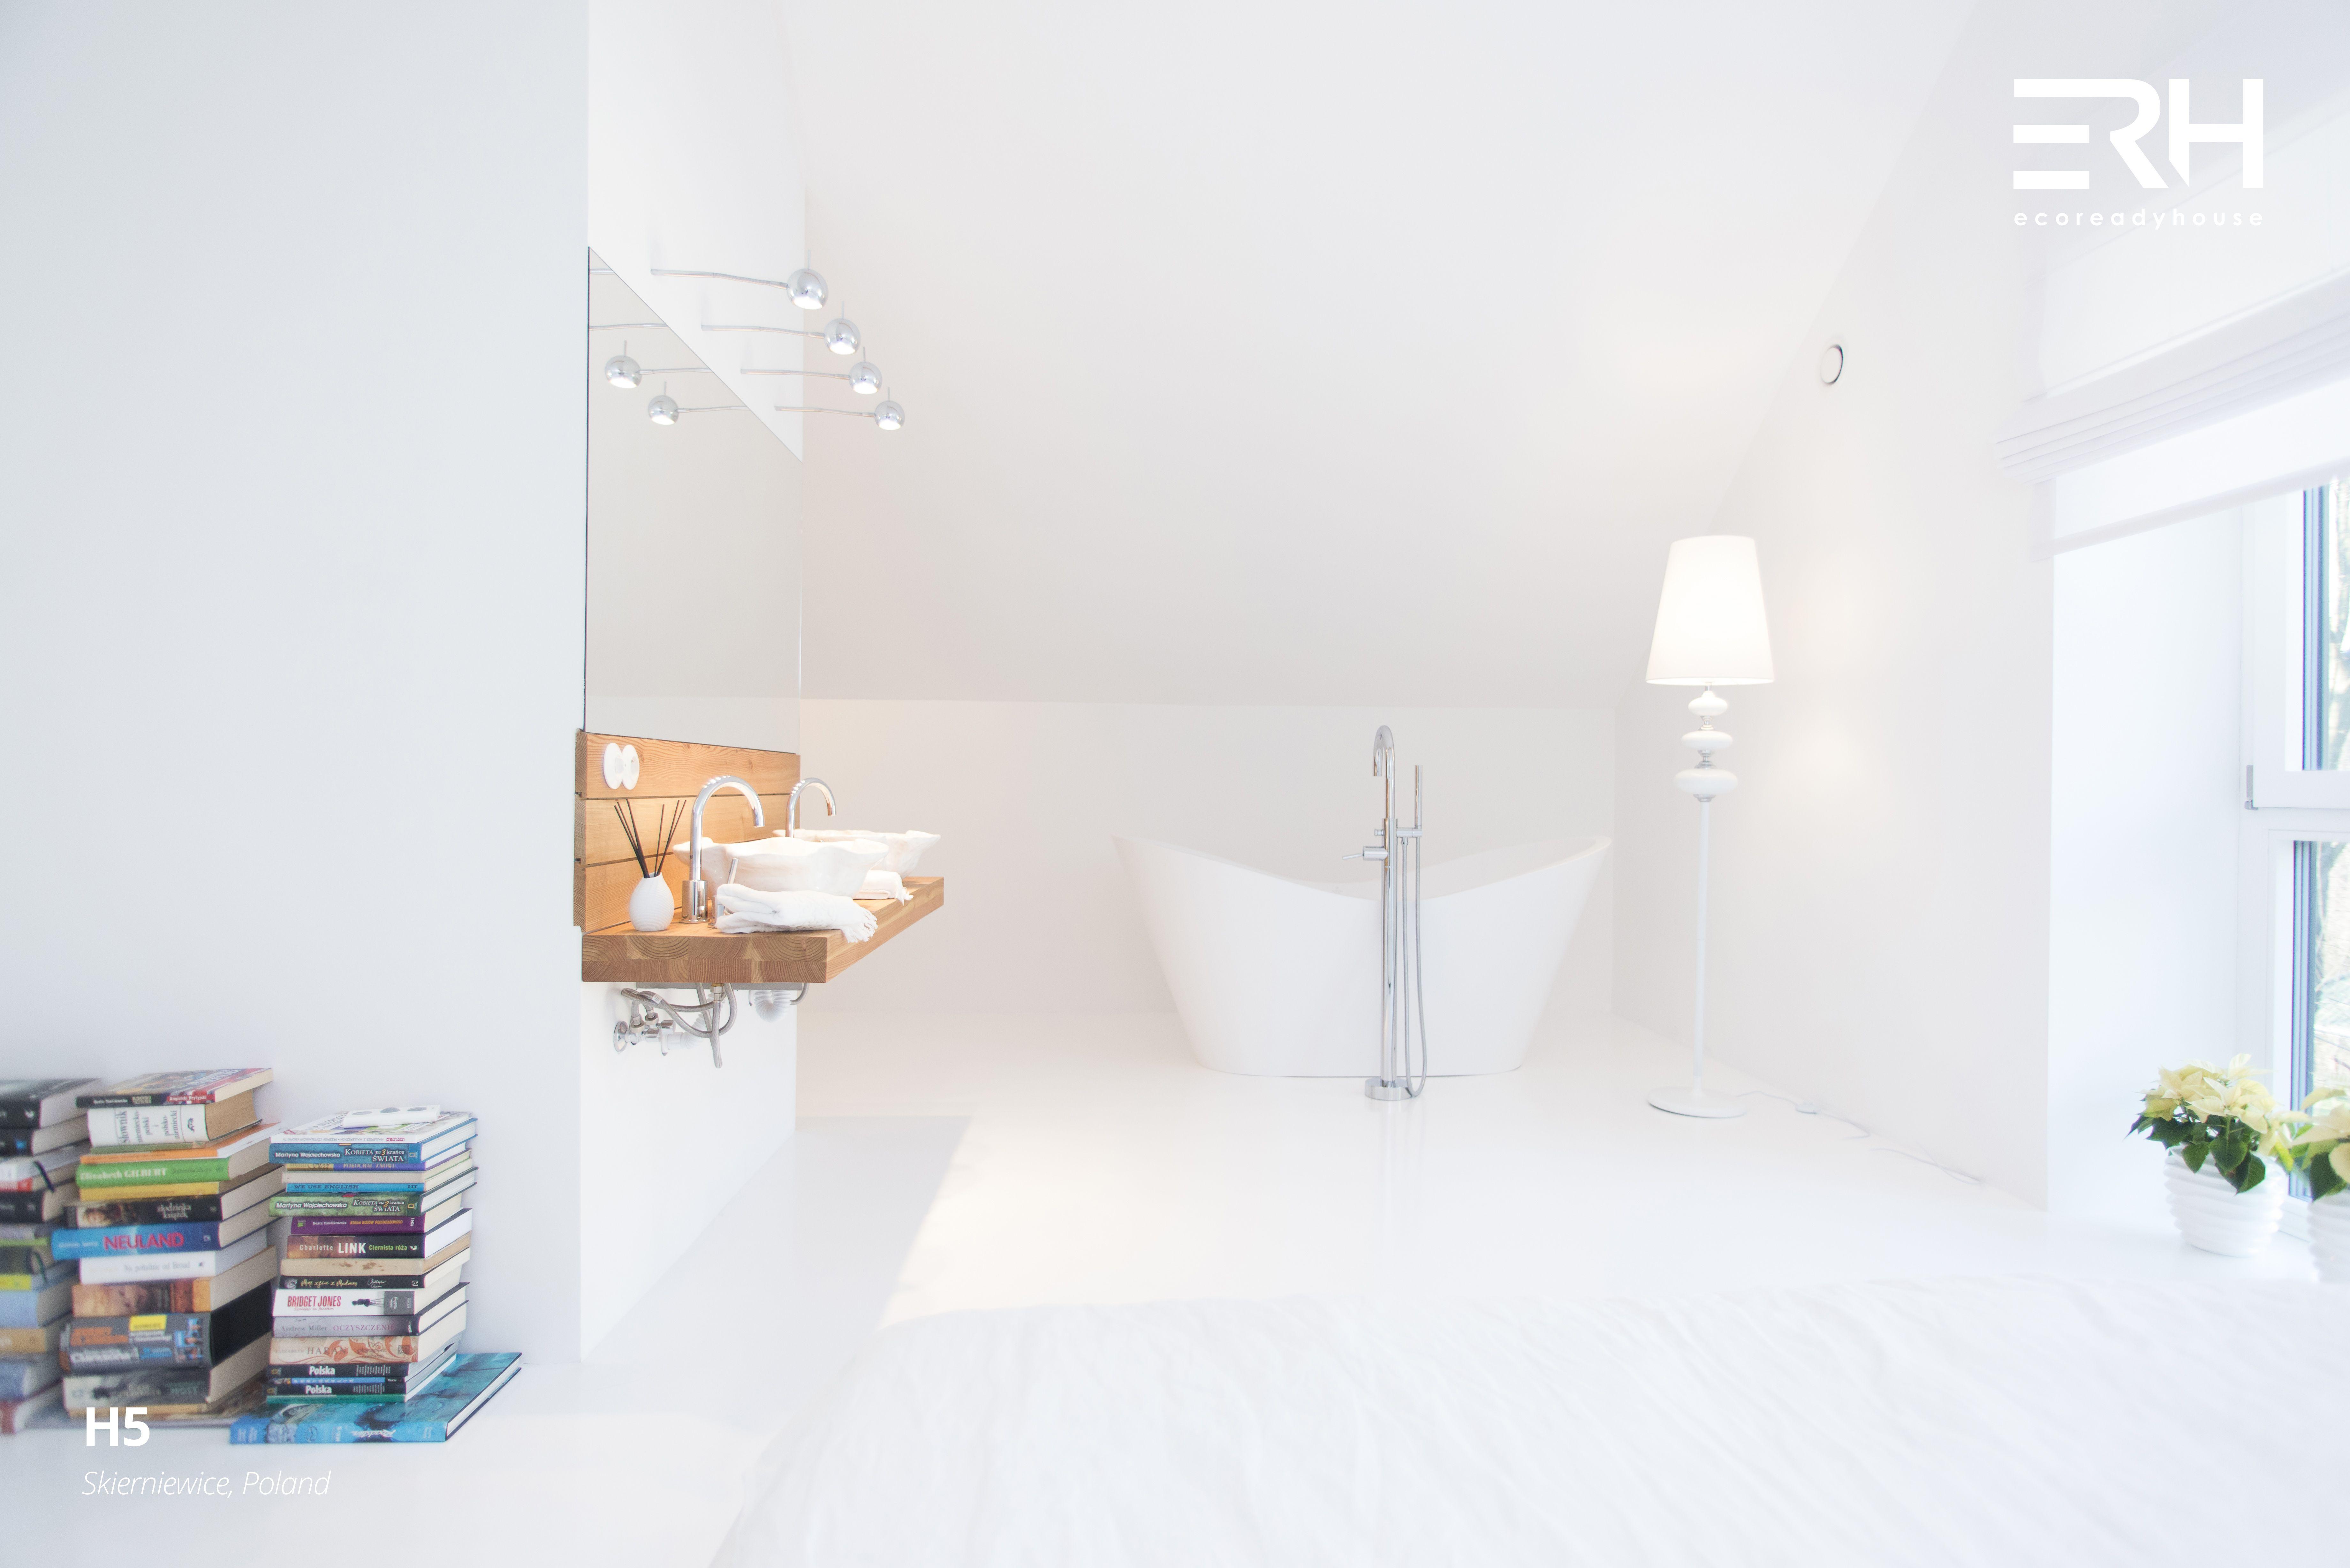 House H5 in Skierniewice, Poland #architecture #design #modernarchitecture #dreamhome #home #house #modernhome #modernhouse #moderndesign #homedesign #homesweethome #scandinavian #scandinaviandesign #lifestyle #stylish #bigwindows #interior #interiors #homeinterior #pastel #bathtube #woods #comfortzone #cozy #bedroom #bathroom #spazone #white #decor #books #art #openspace #ecoreadyhouse #erh